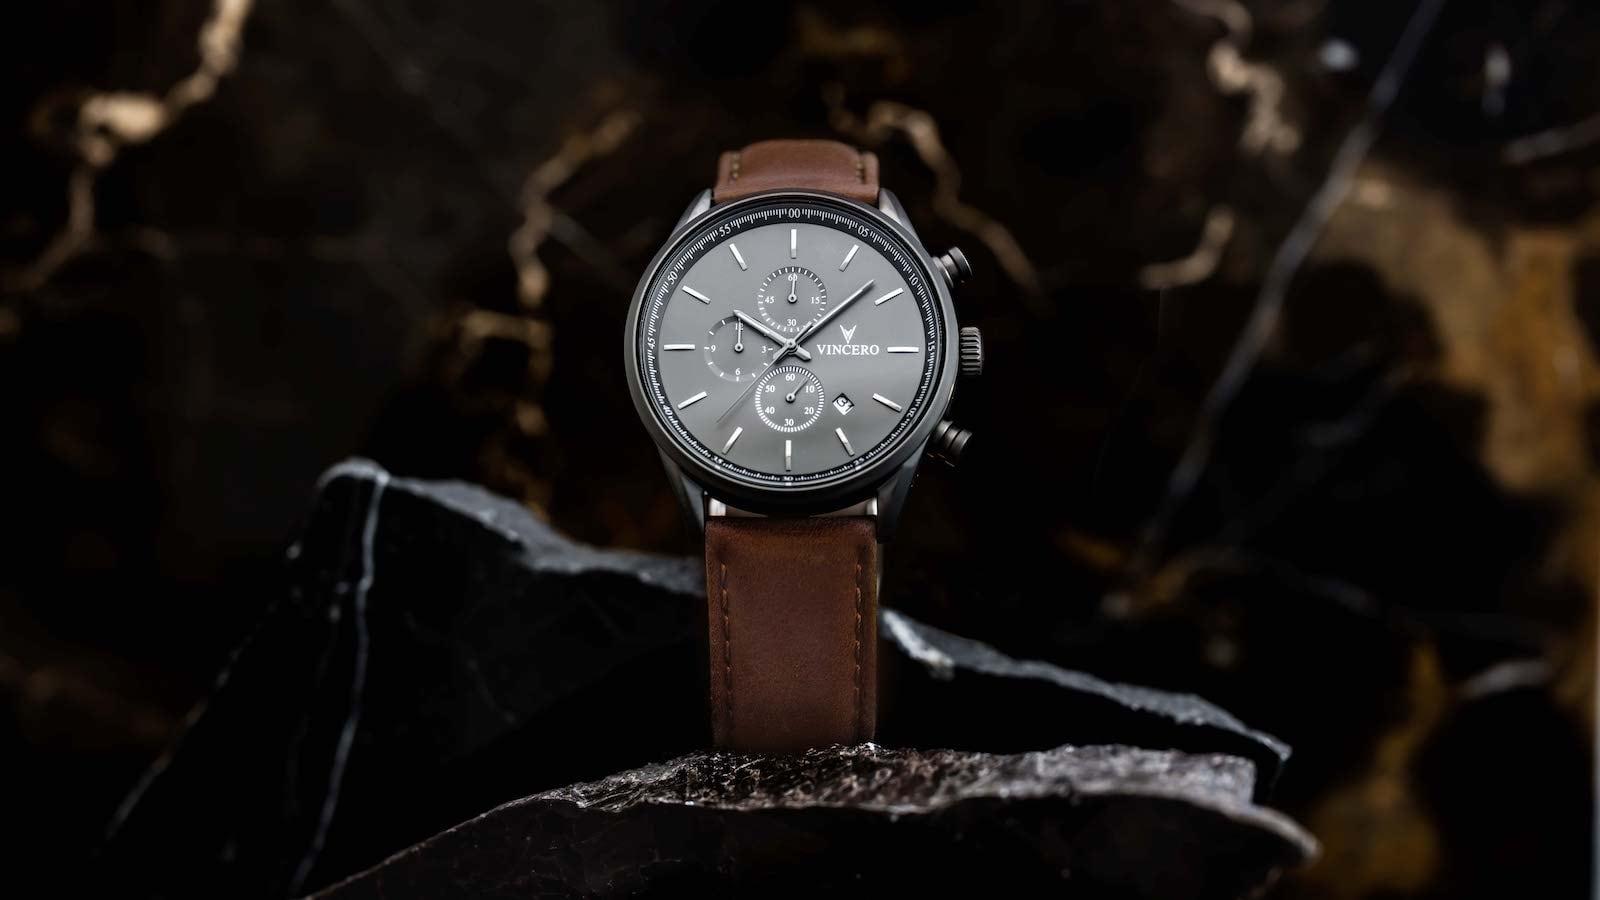 Vincero Chrono S Mens Chronograph Watch